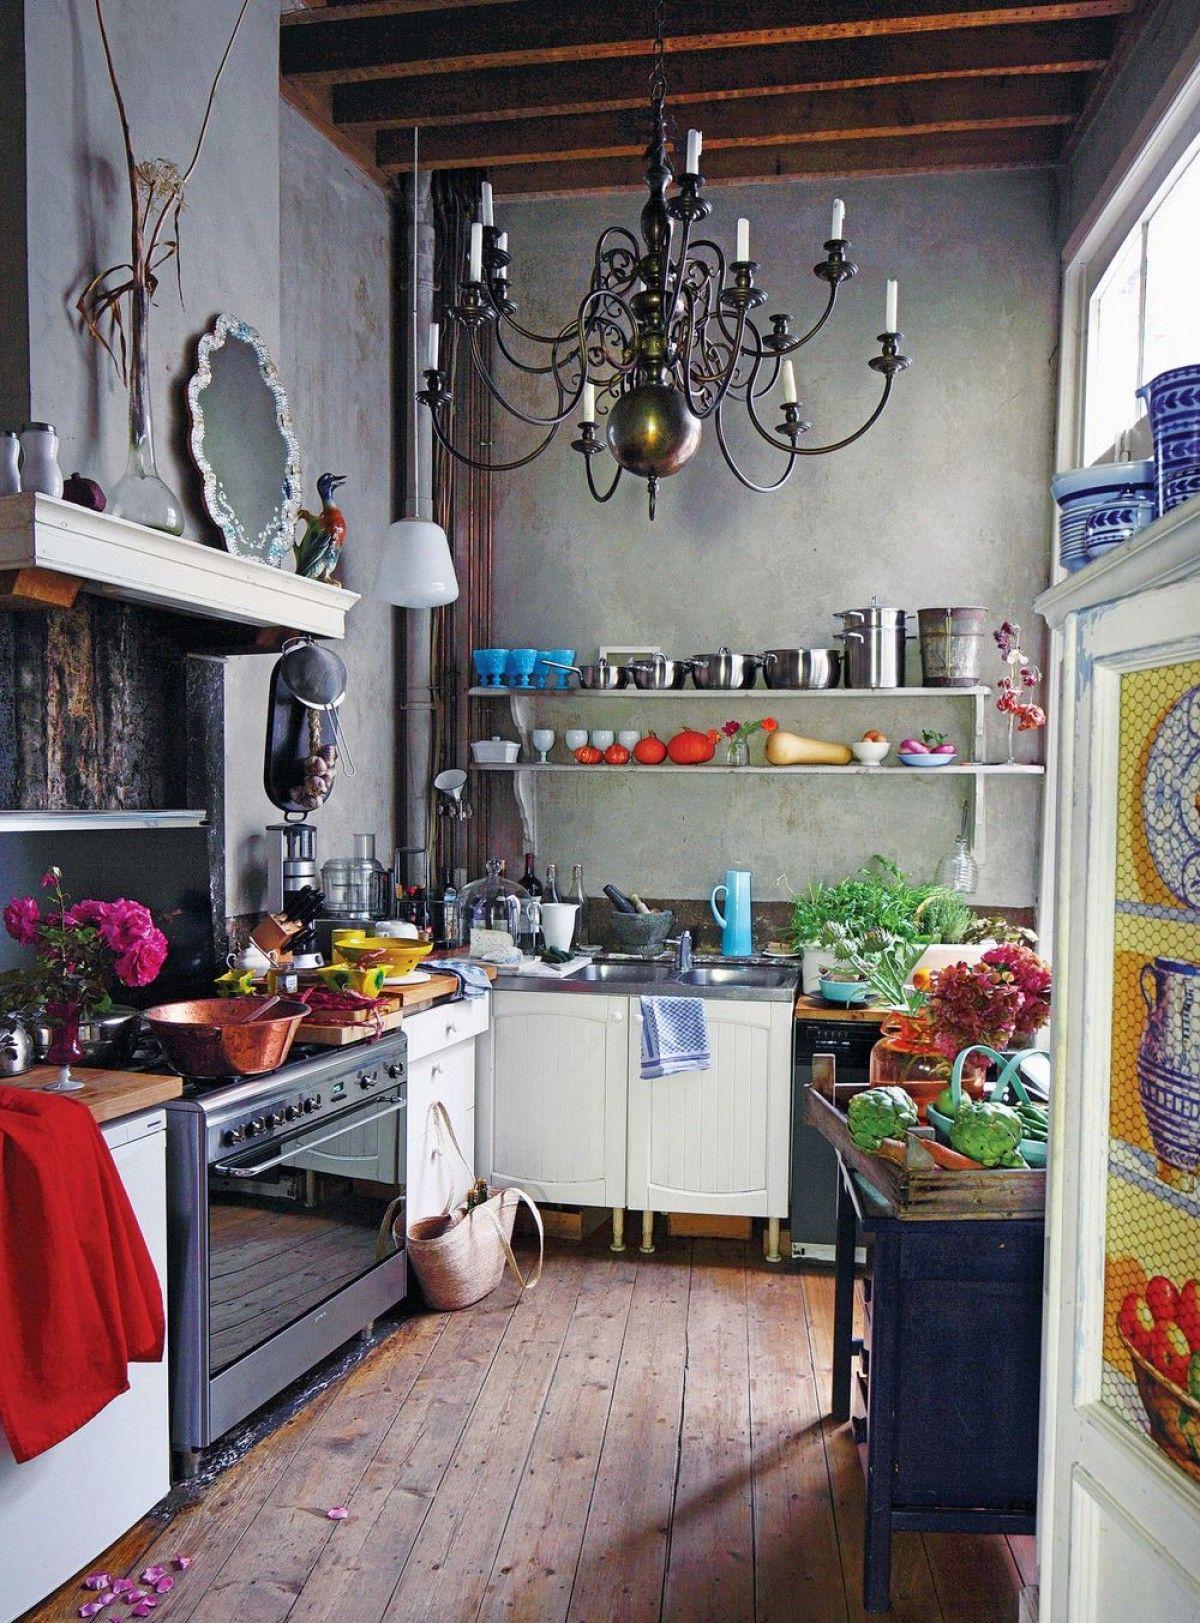 10 Beautiful Bohemian Kitchen Ideas & Designs | Diseño para el hogar ...